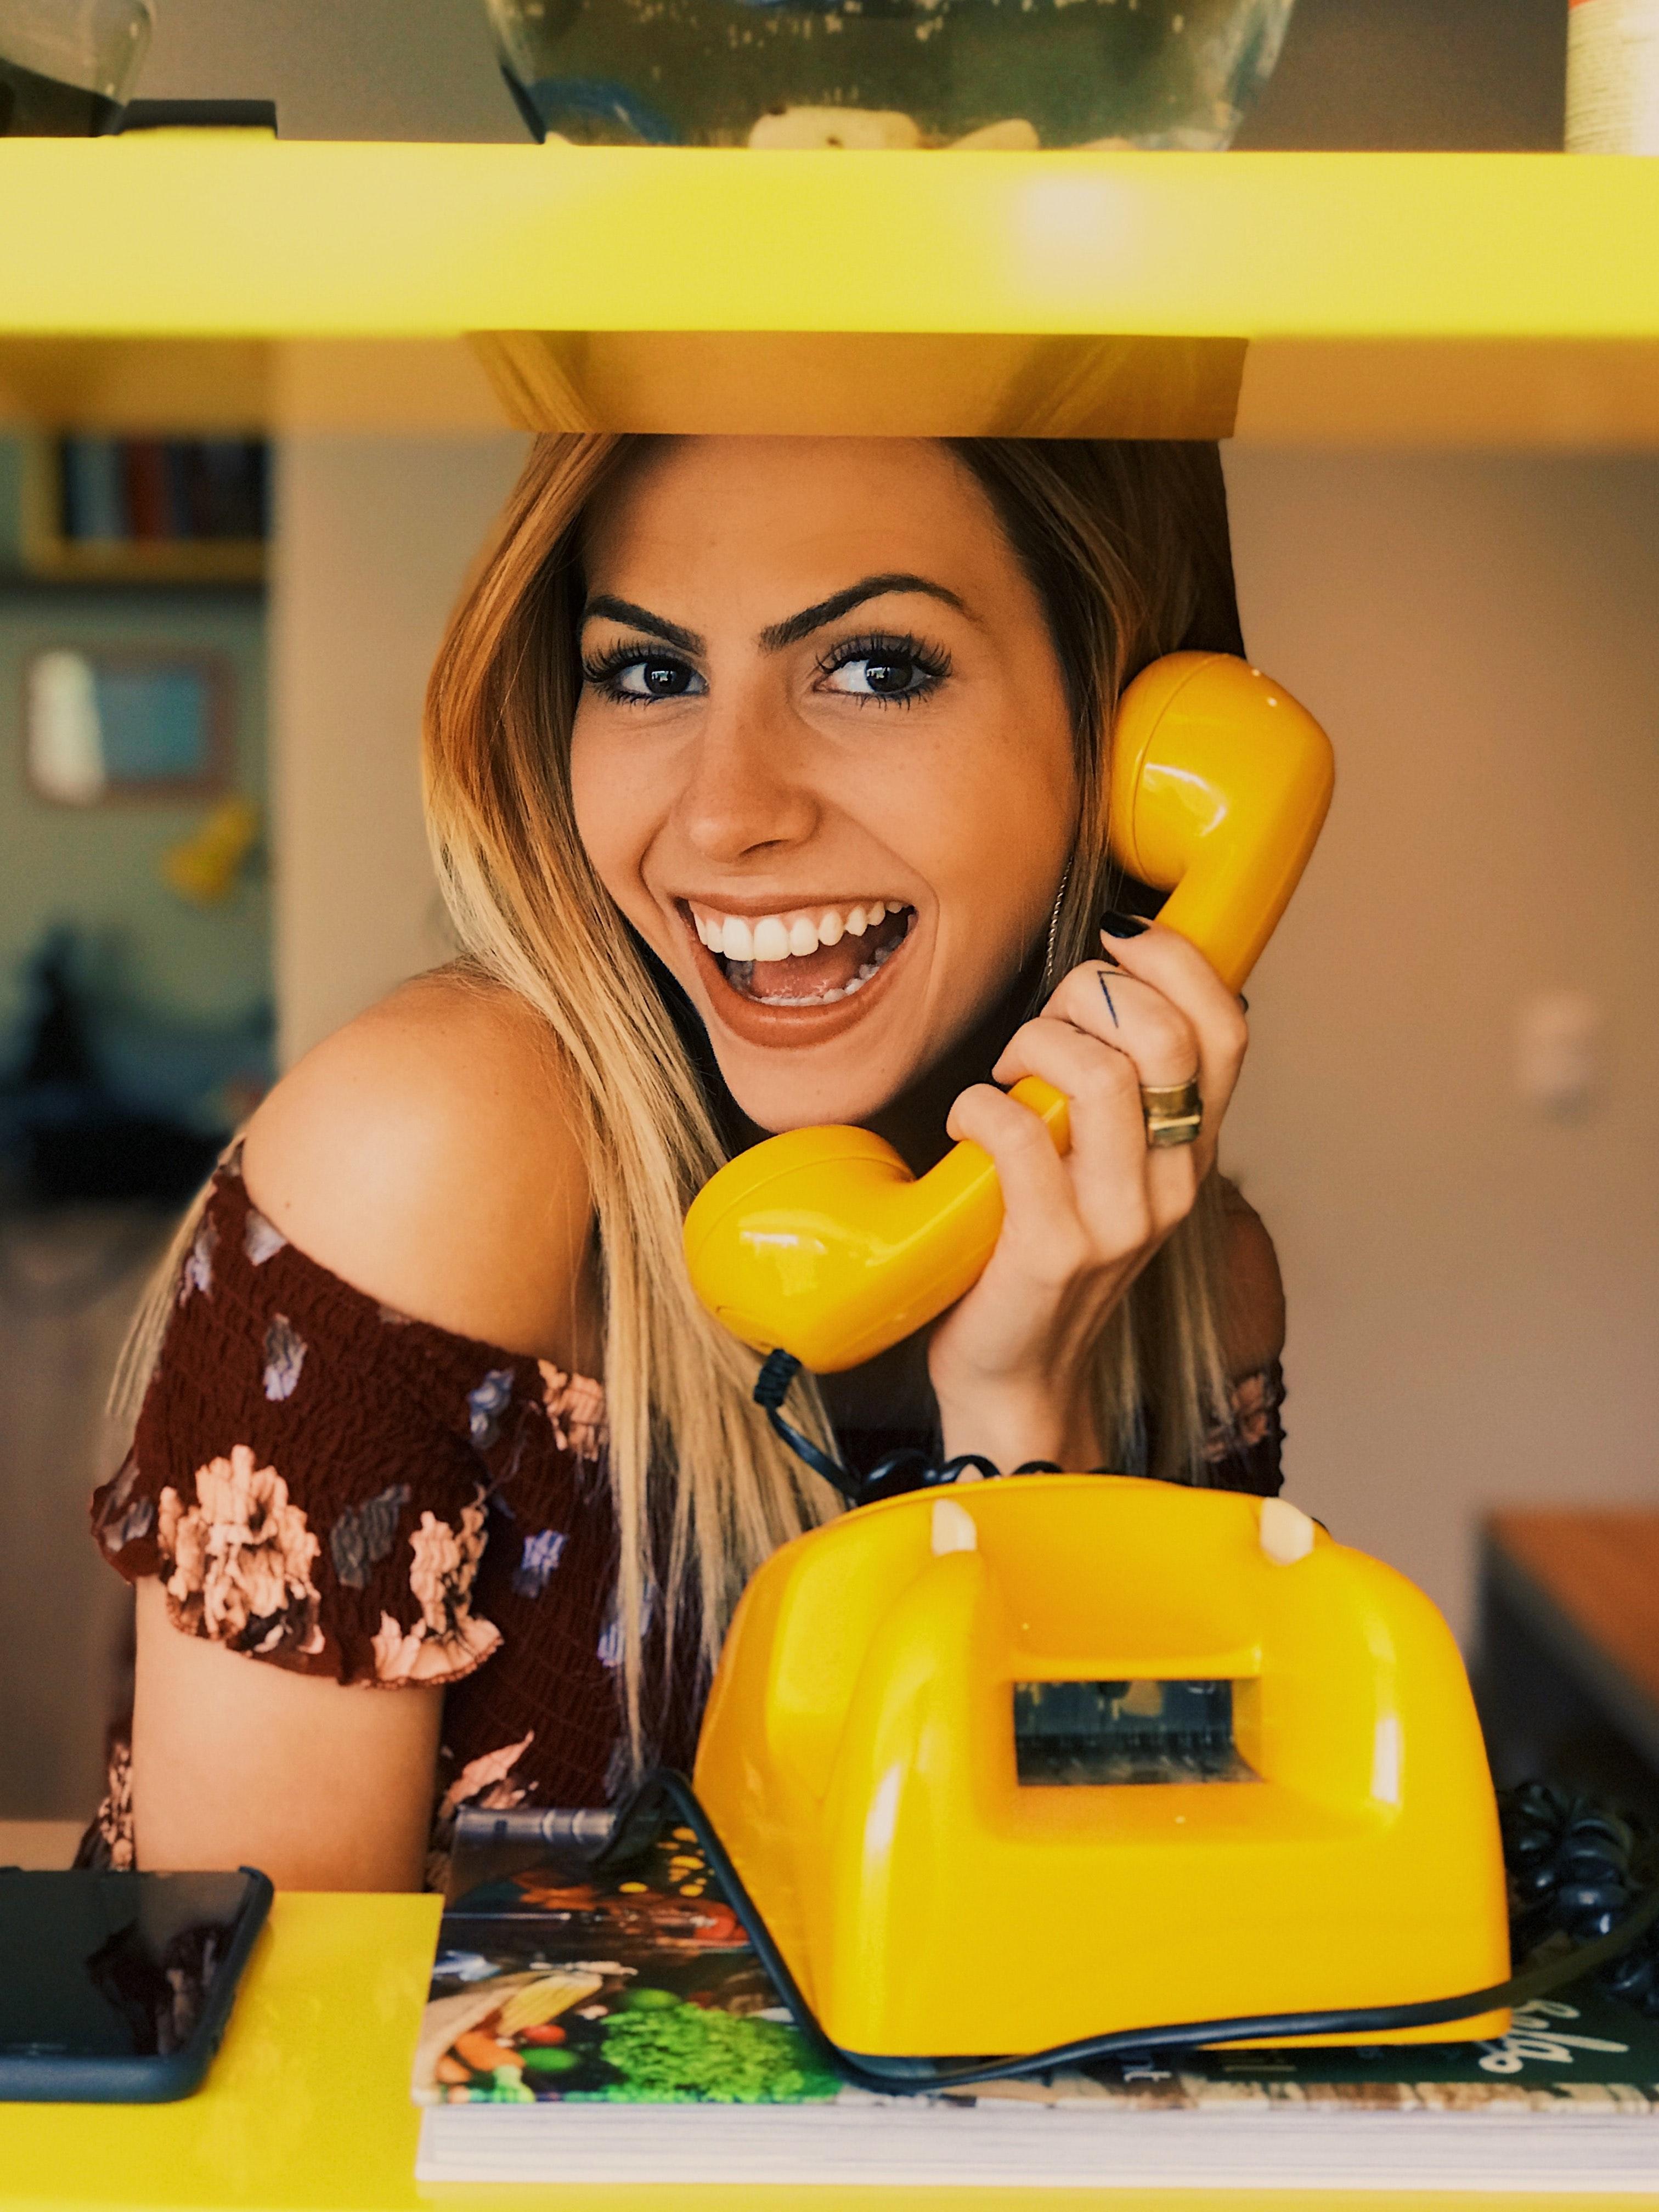 a woman holding a banana